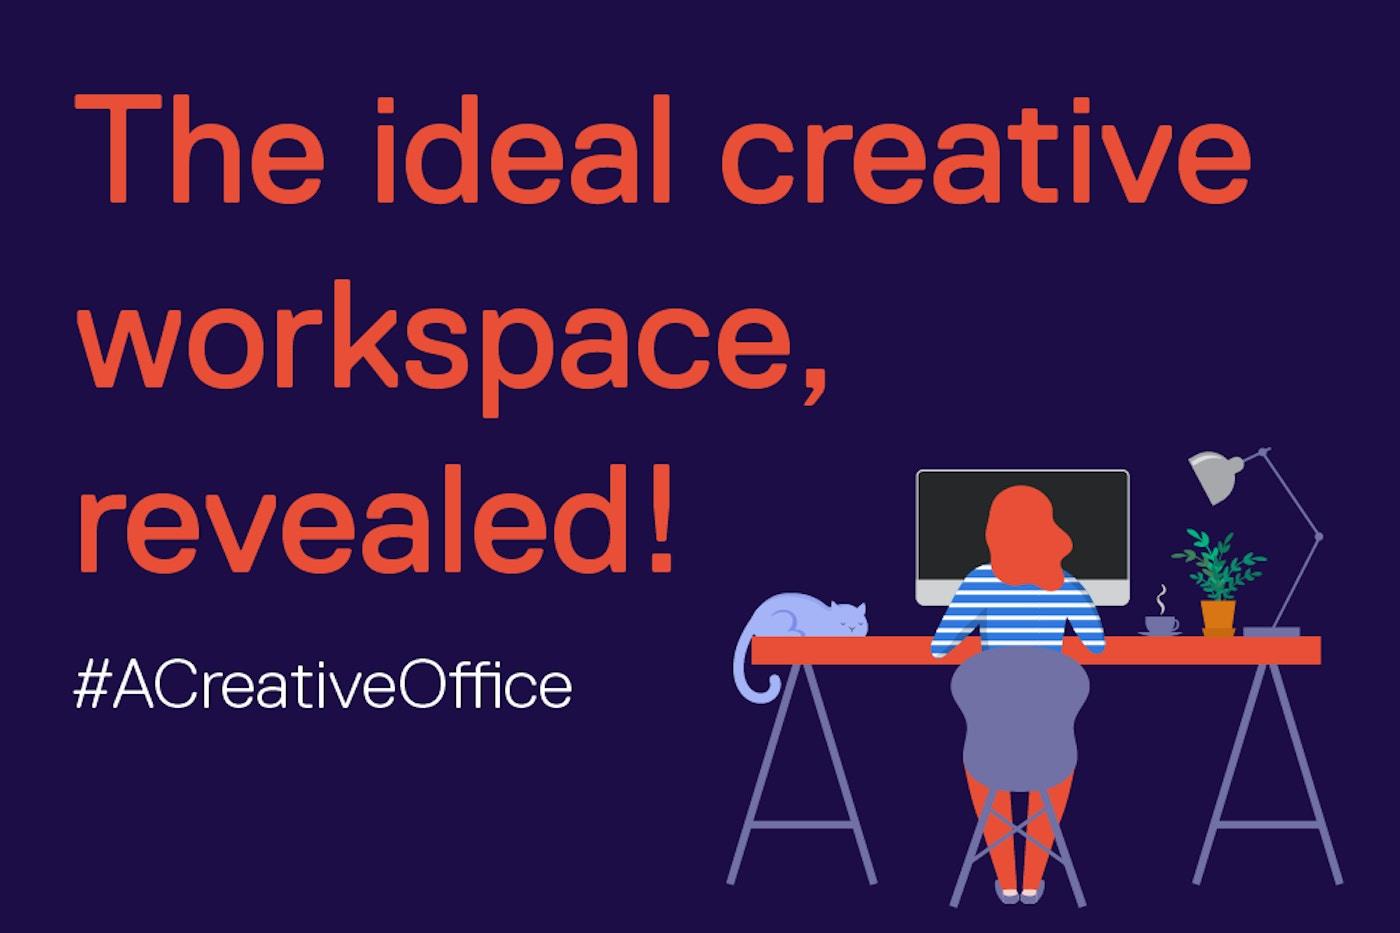 Hunts Ideal Creative Workspace Header